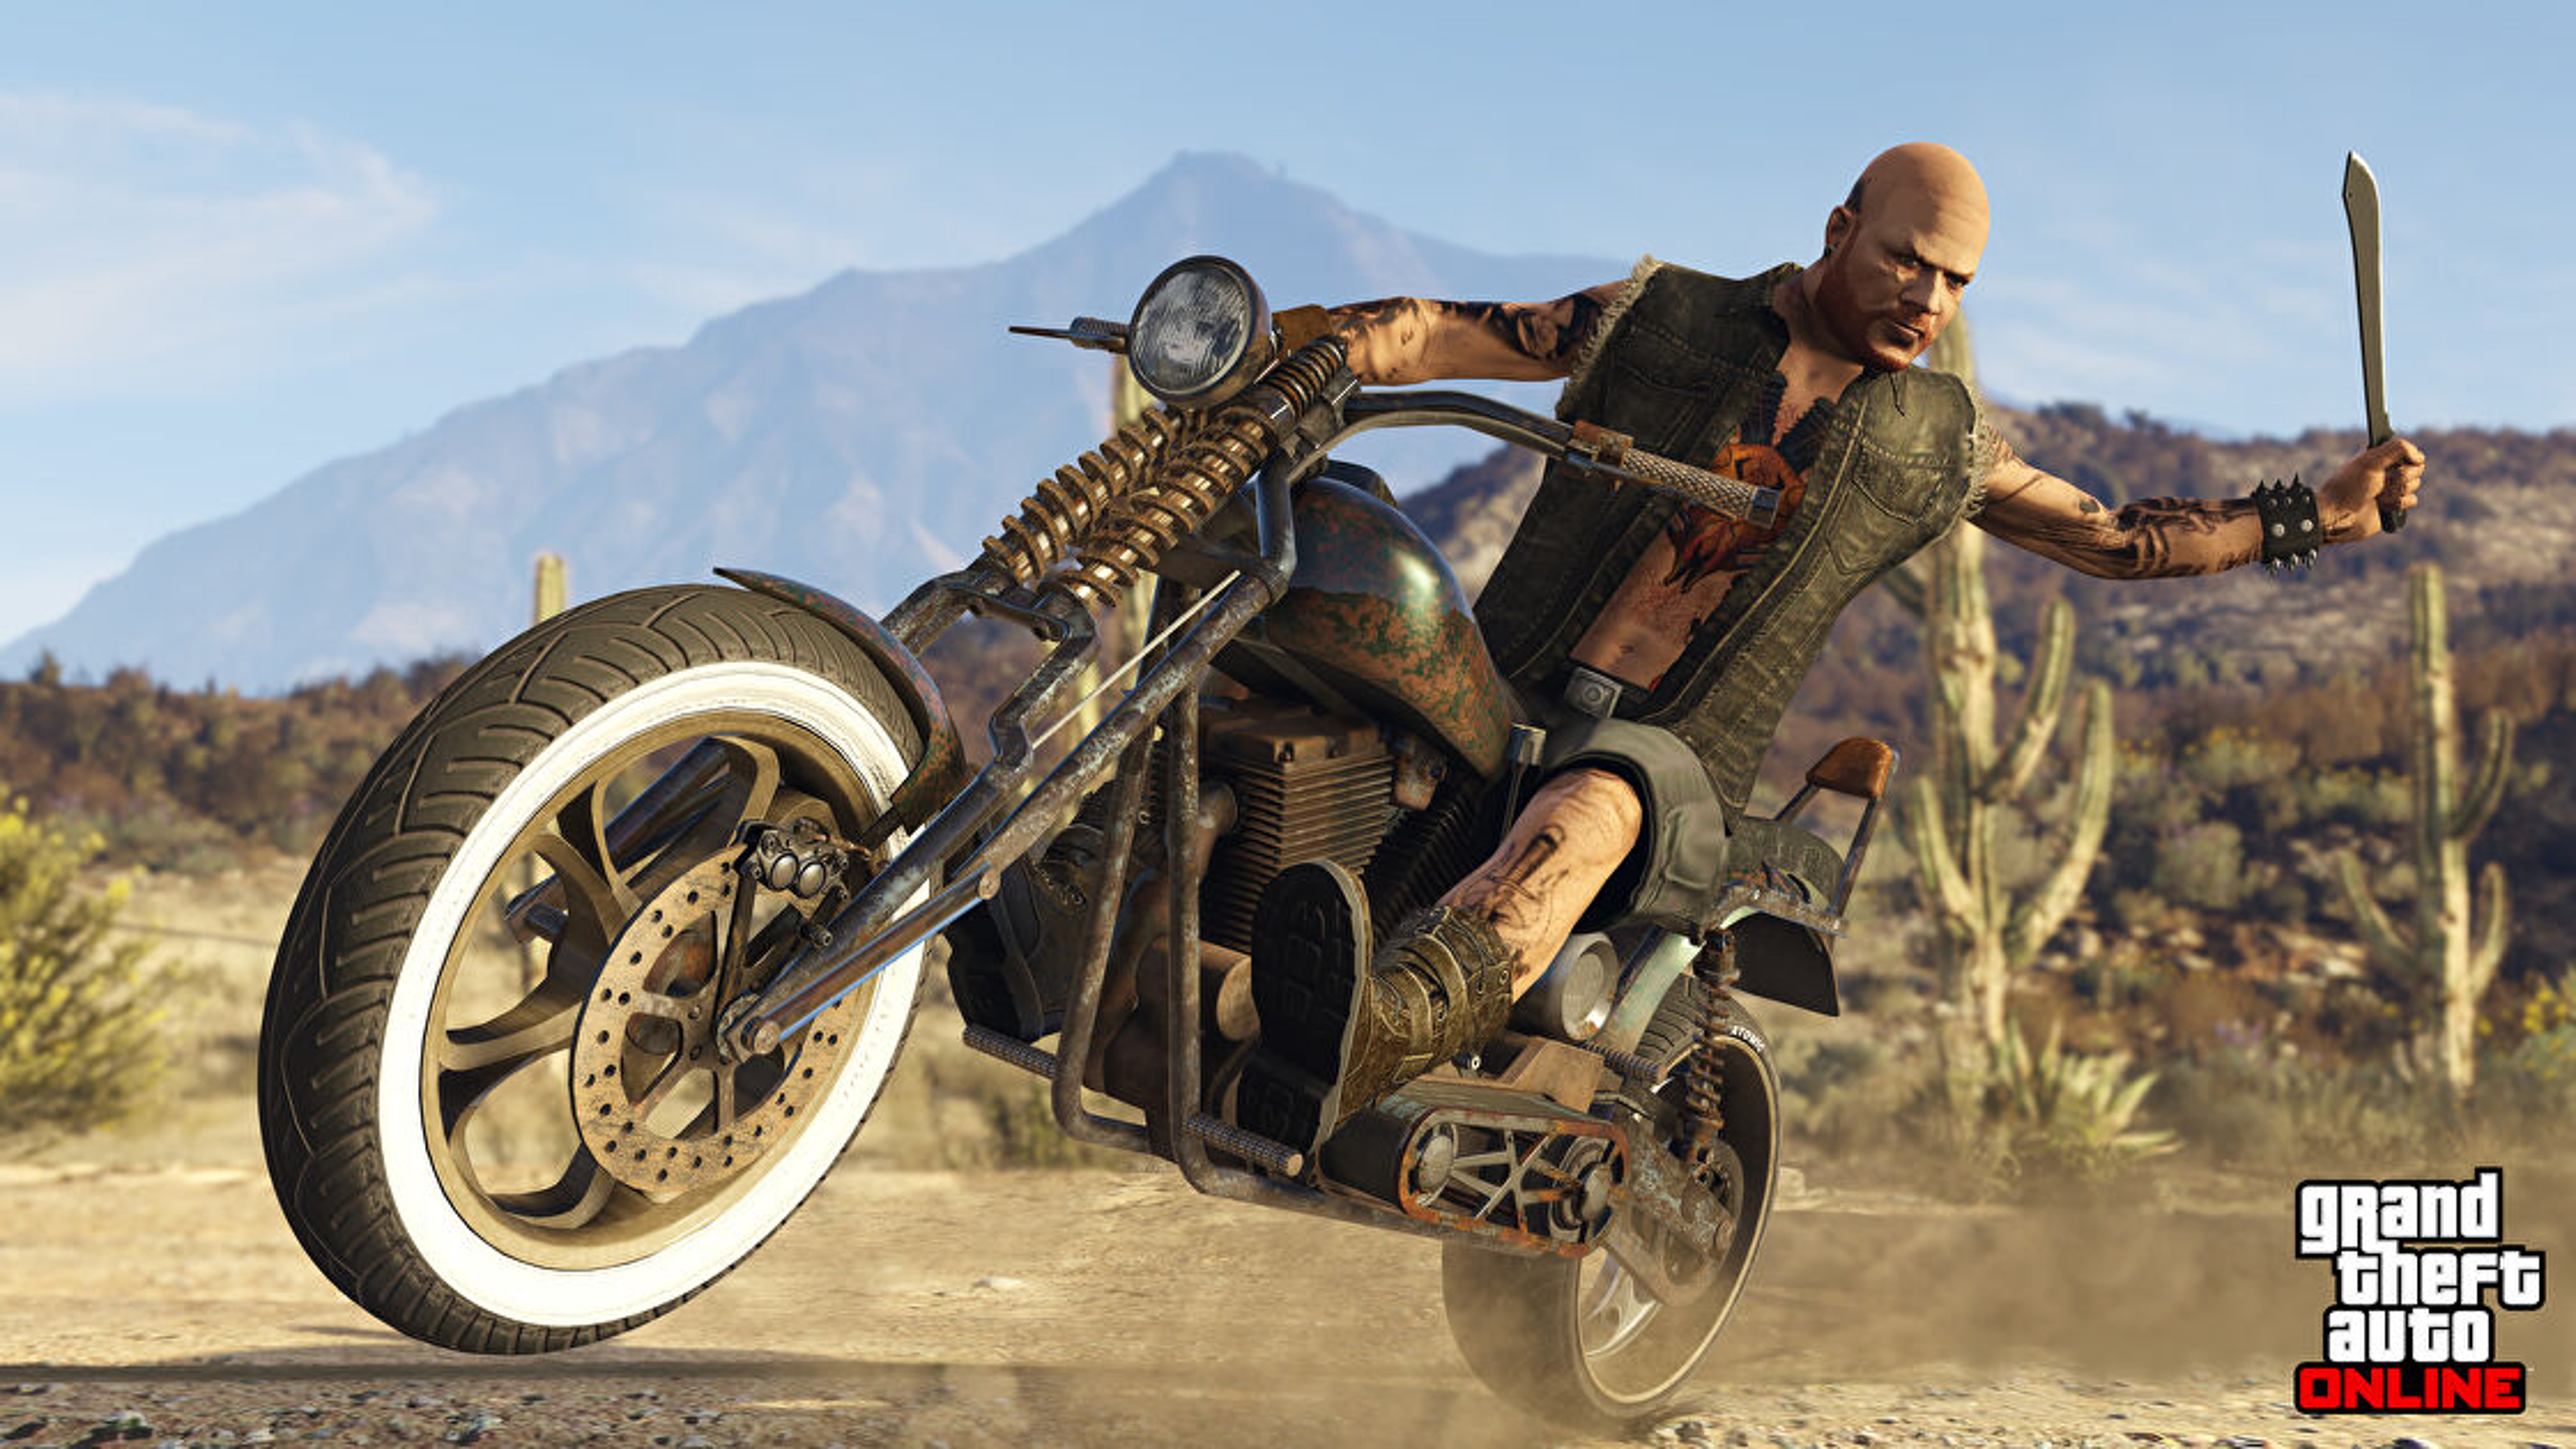 Dengan bersepeda GTA Online Actions dan Adversary Modes, Rockstar memberi ruang untuk misi dan mod baru.